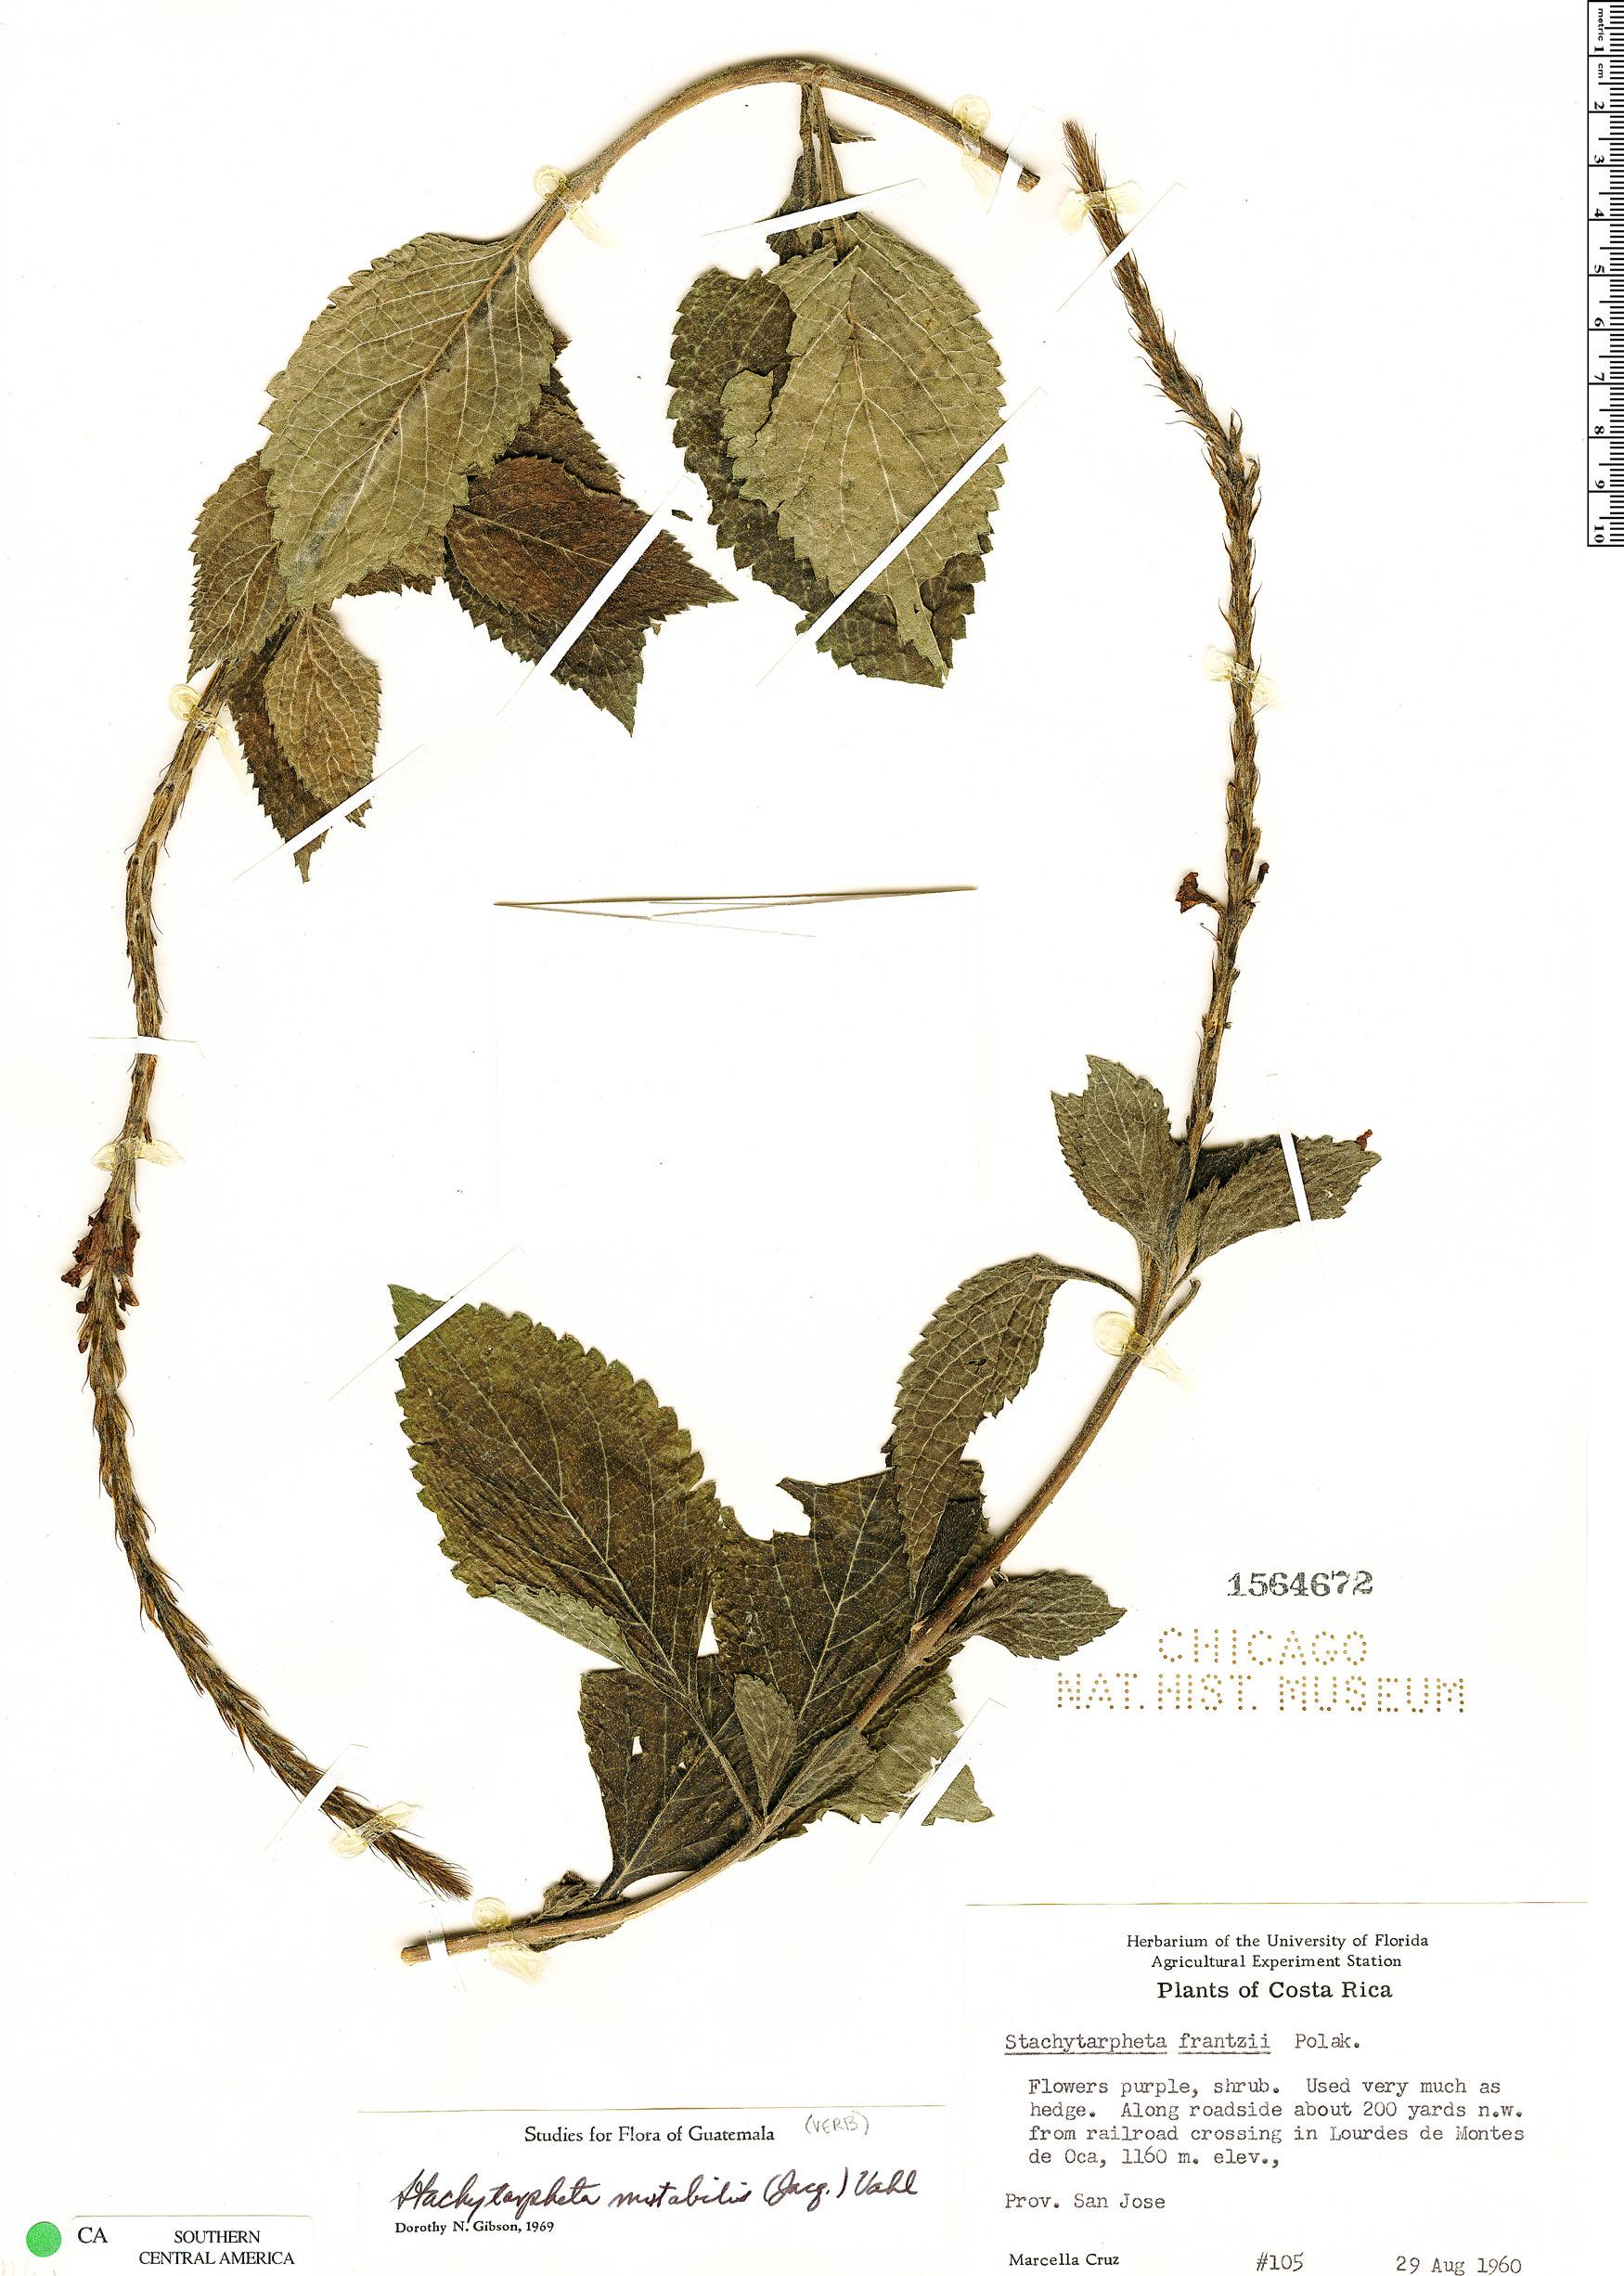 Stachytarpheta mutabilis image